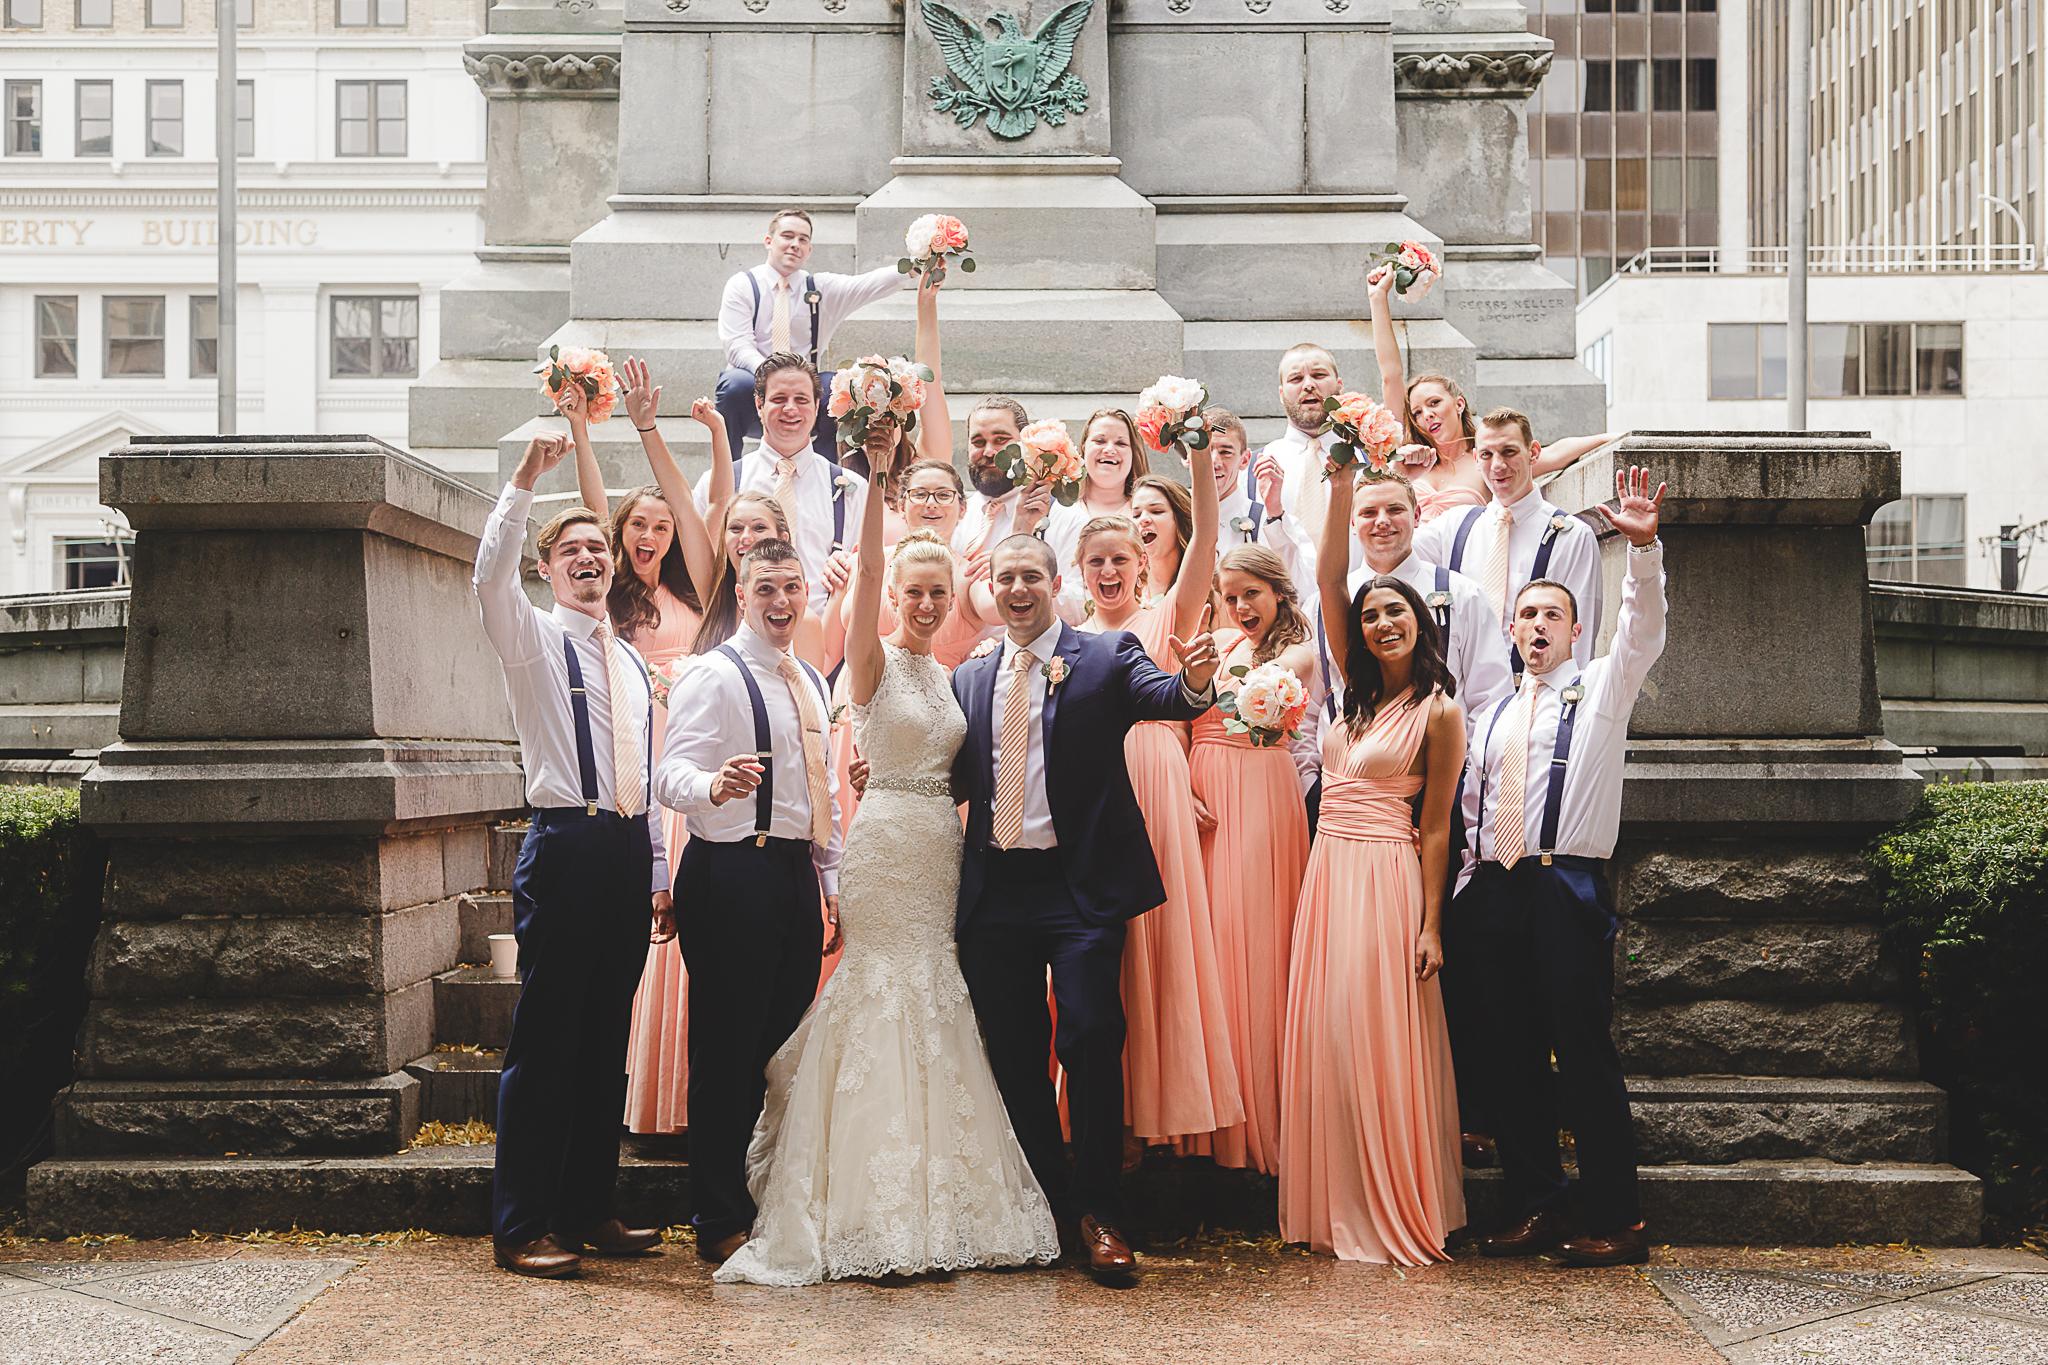 Photography by Buffalo NY Wedding Photographer - www.buffaloweddingphotographer.co